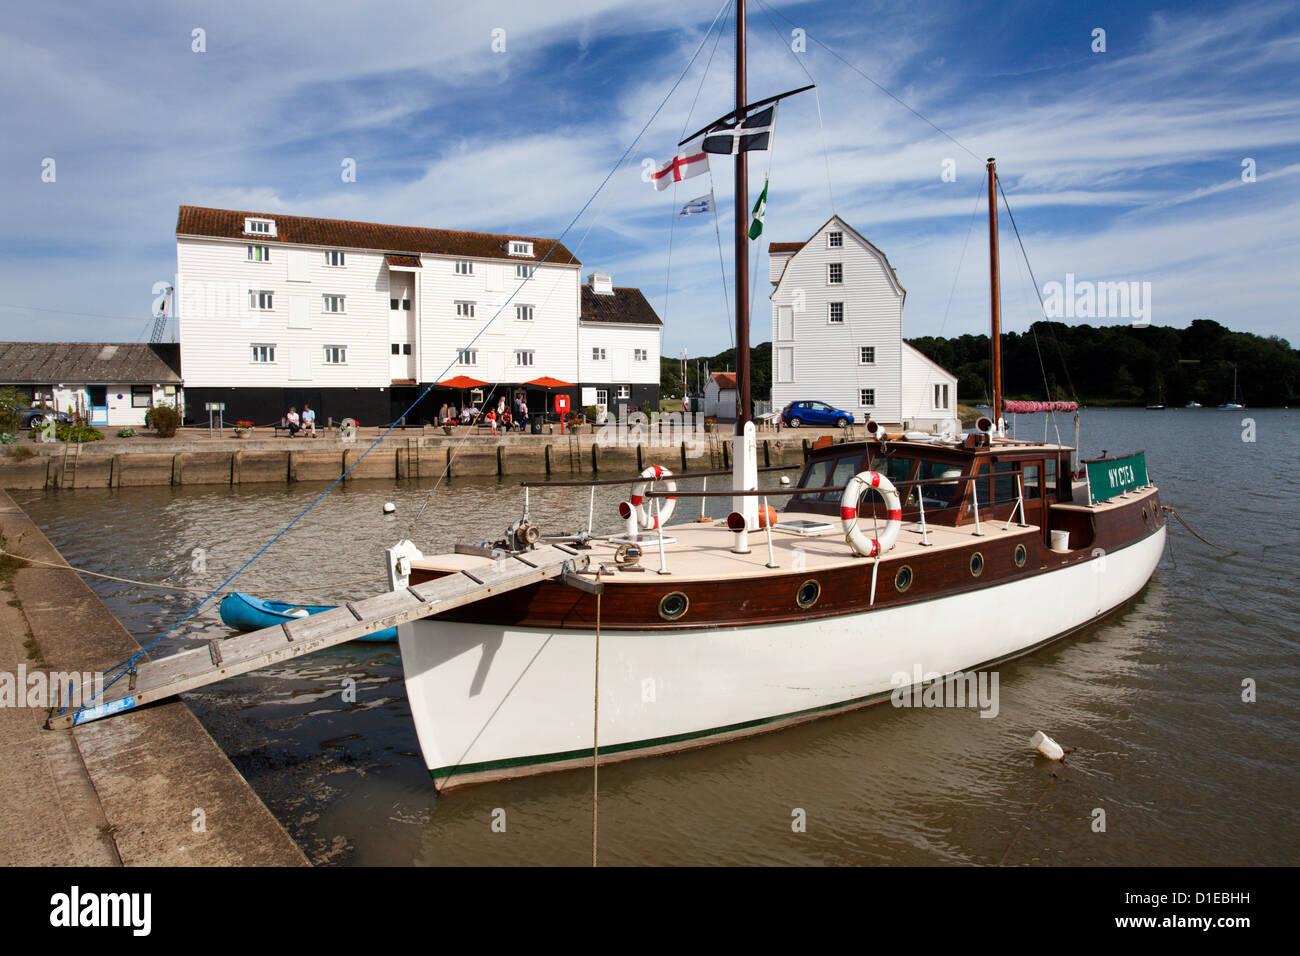 Yacht moored by the Tide Mill at Woodbridge Riverside, Woodbridge, Suffolk, England, United Kingdom, Europe - Stock Image